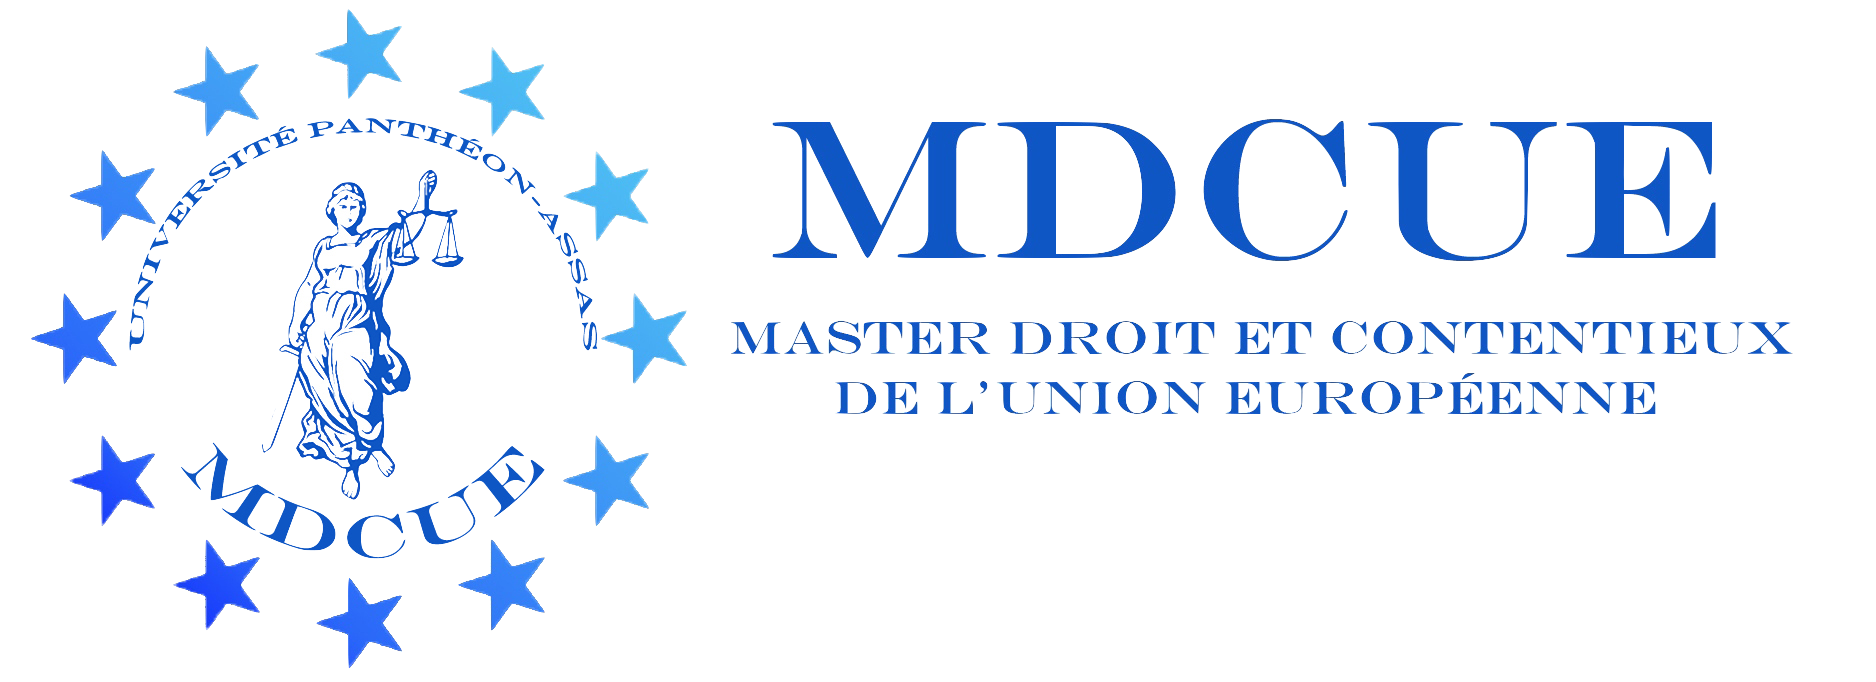 Logo MDCUE définitif transparent